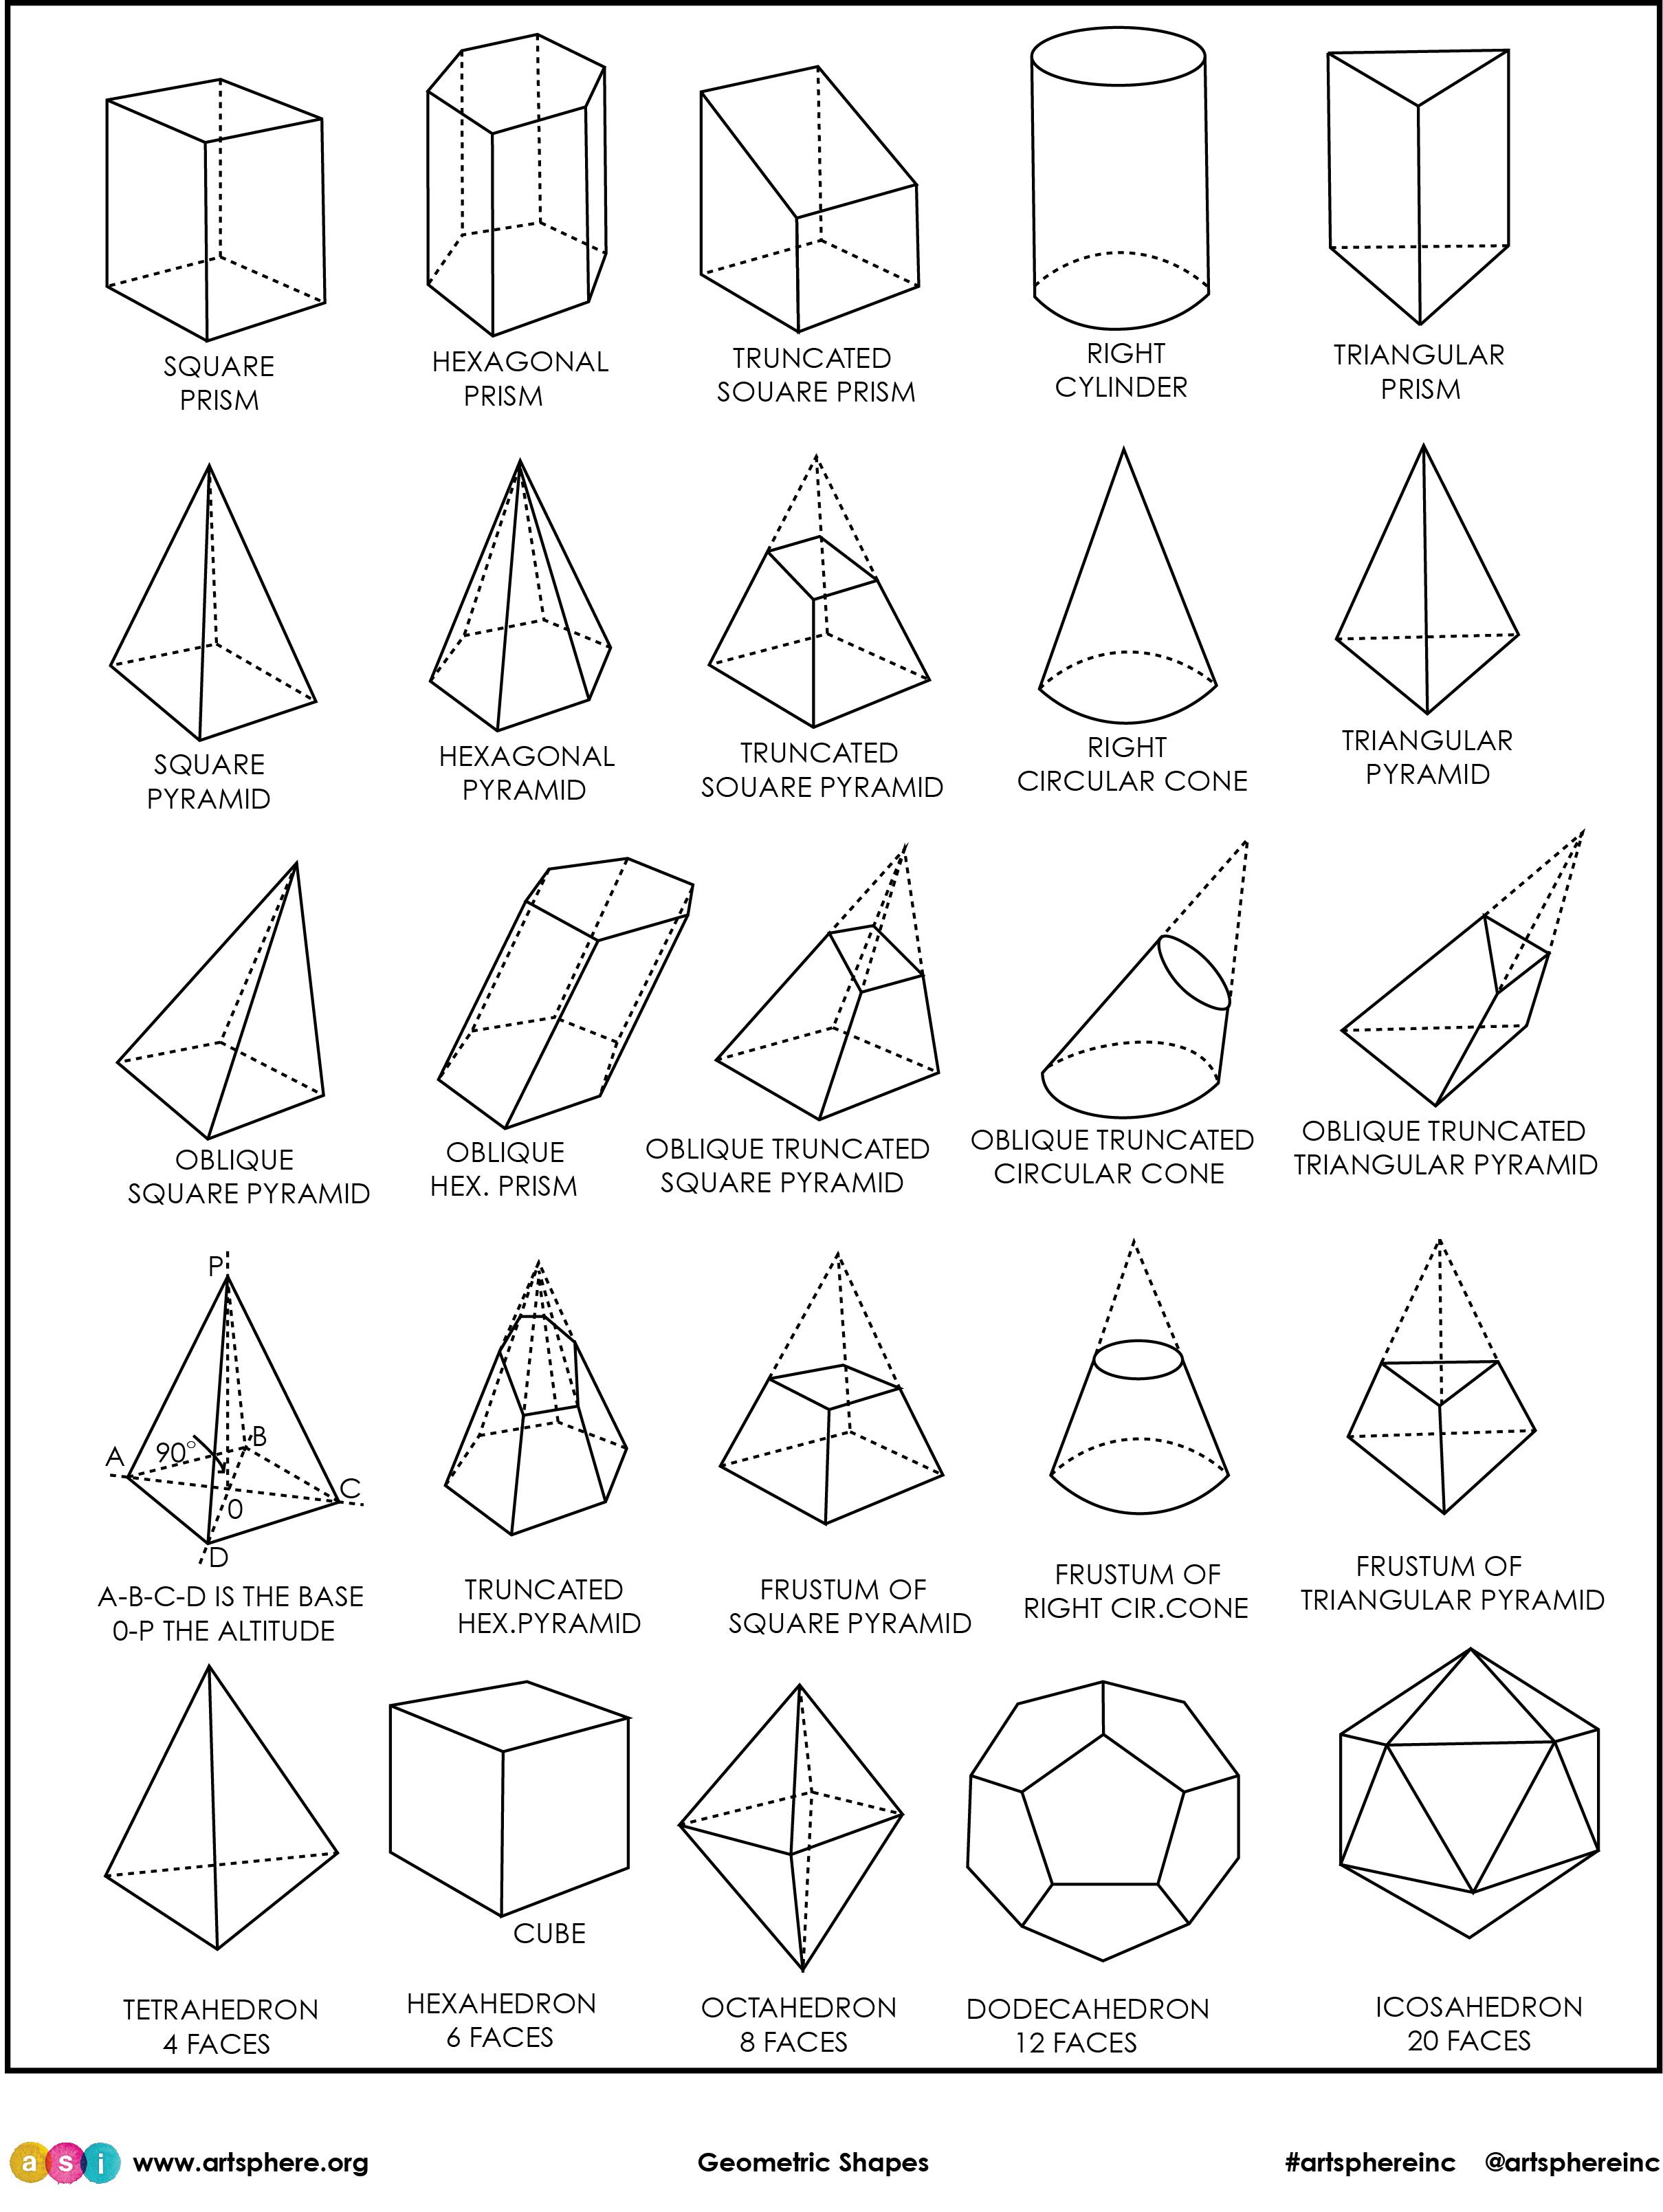 Geometric Shapes Handout